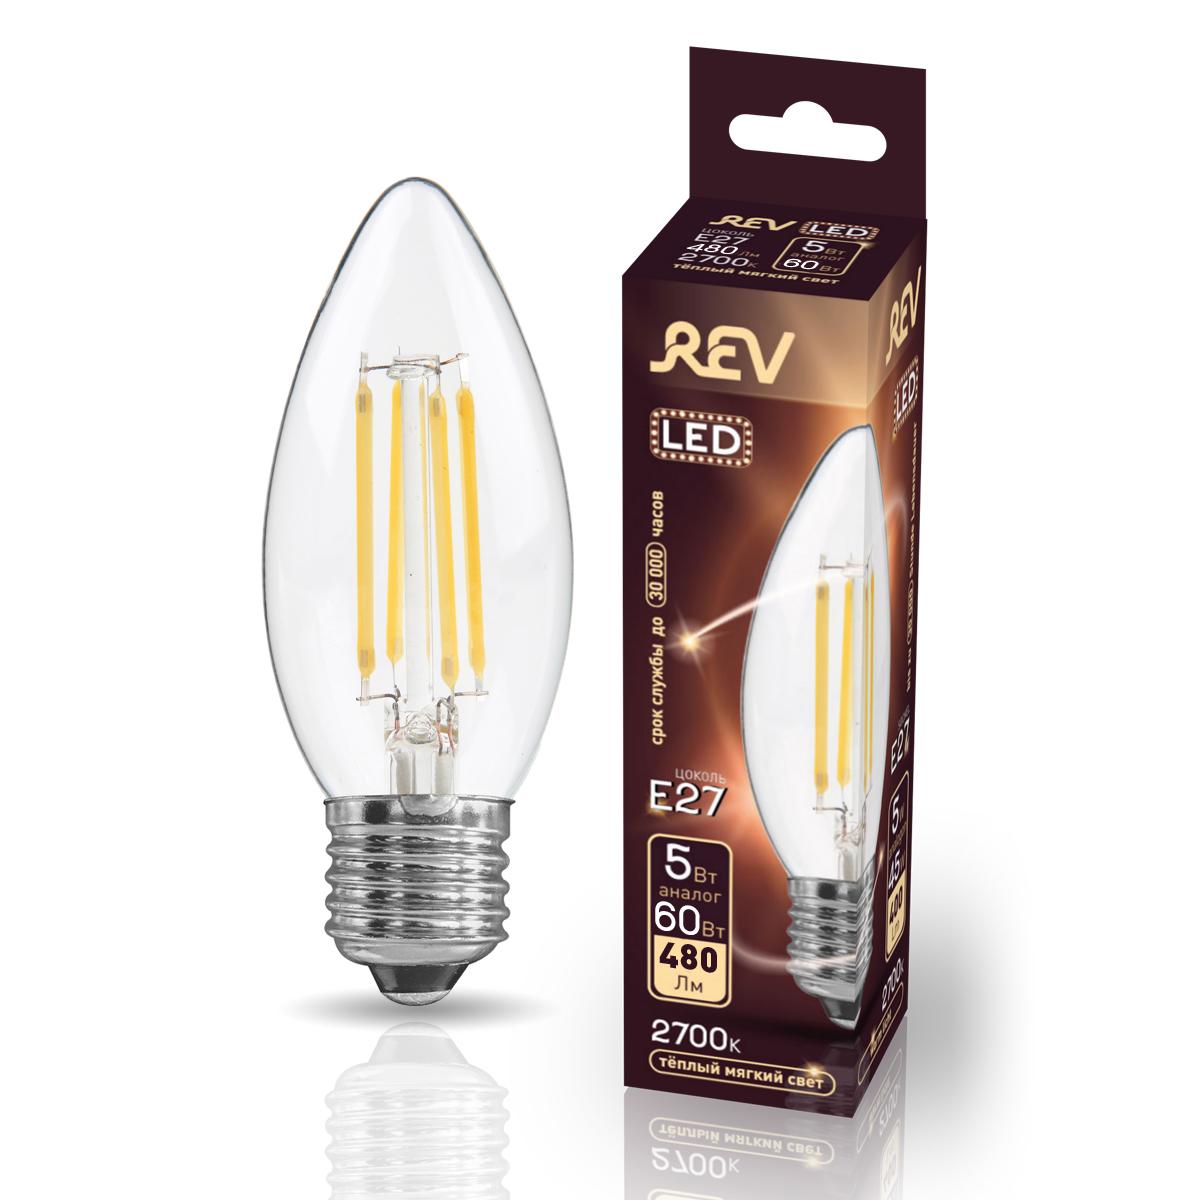 Лампа светодиодная FILAMENT свеча C37 5W E27 2700K DECO Premium теплый свет